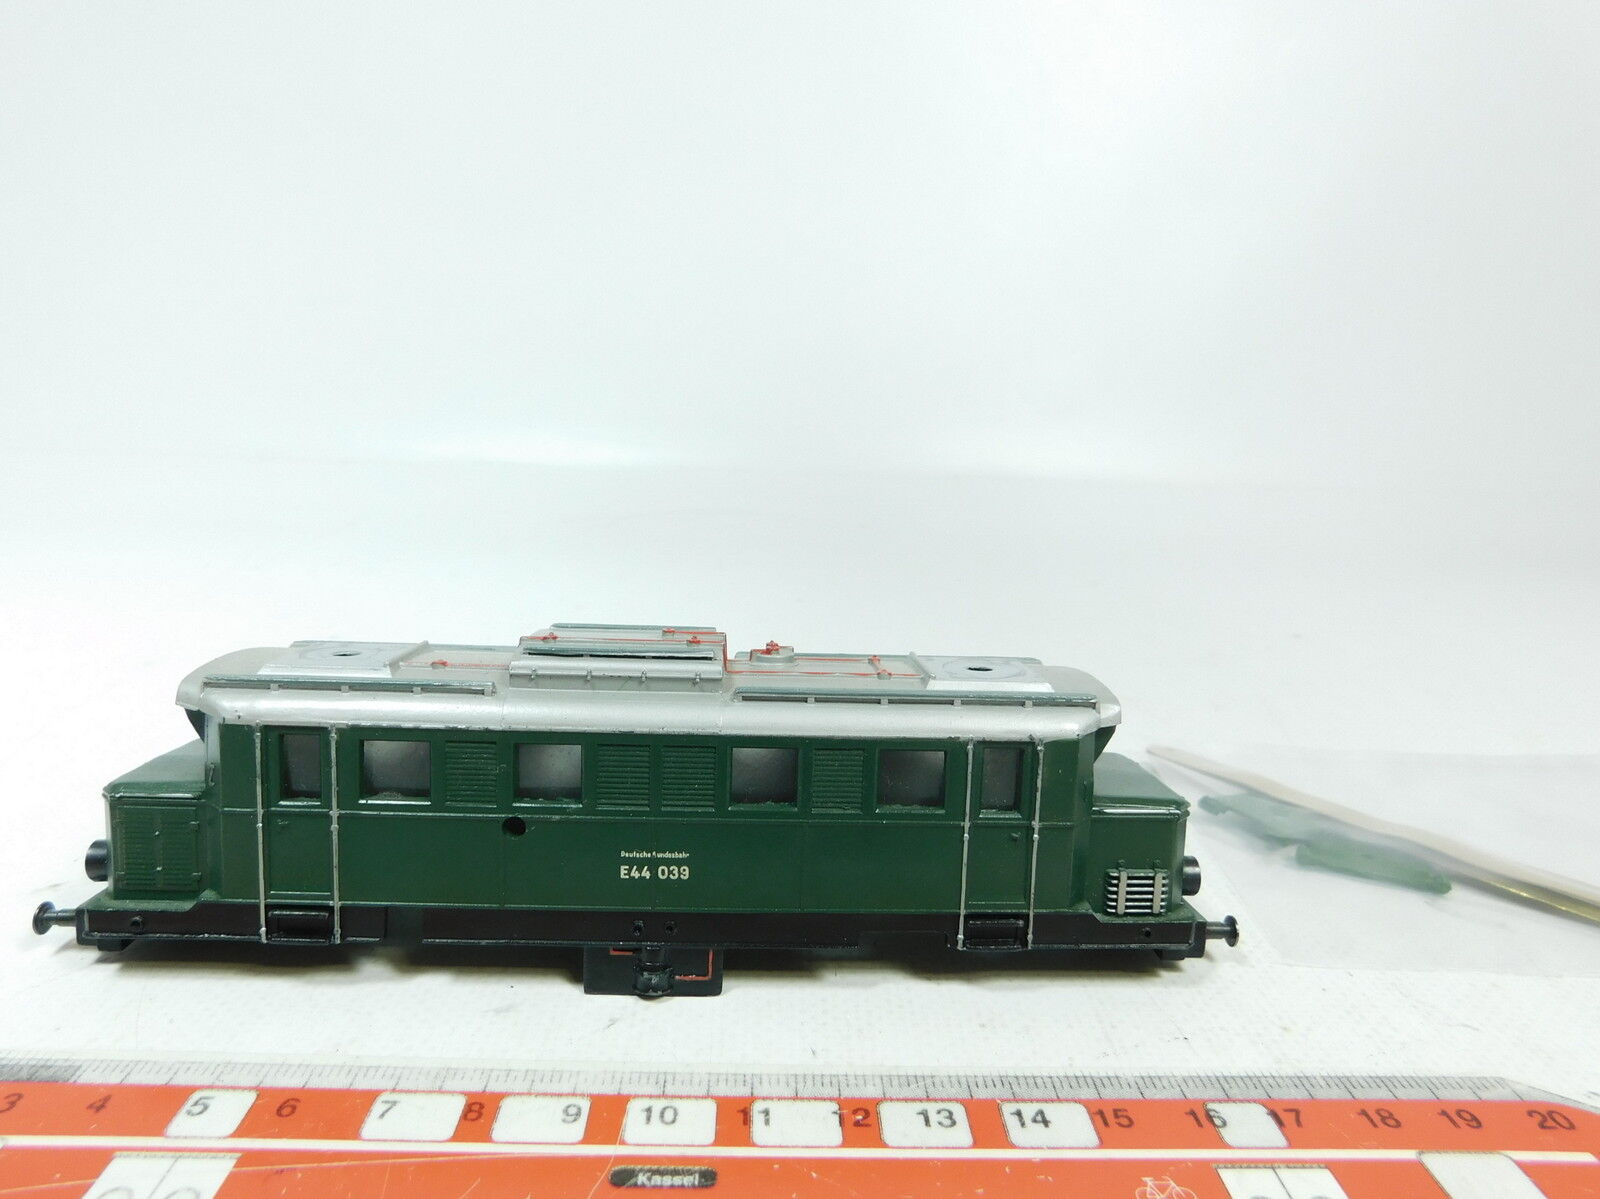 AK139-0,5  Märklin Marklin H0 Cast Iron Casing E44 039 Deutsche Bundesbahn